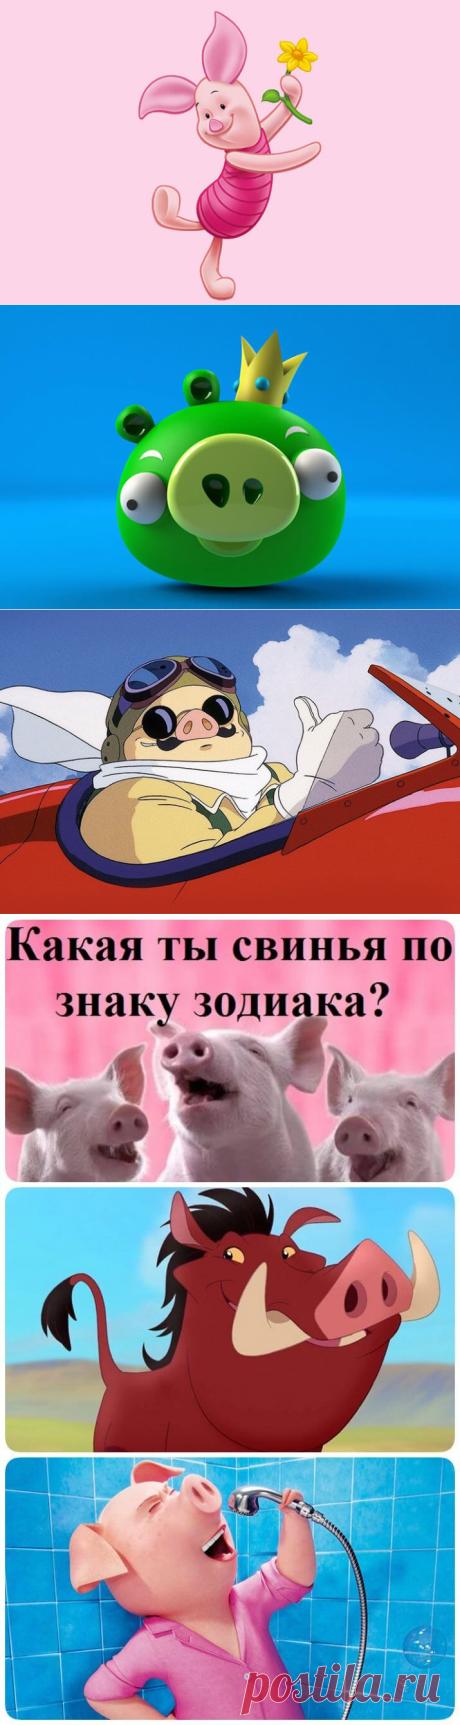 Какая ты свинья по знаку зодиака?   В темпі життя